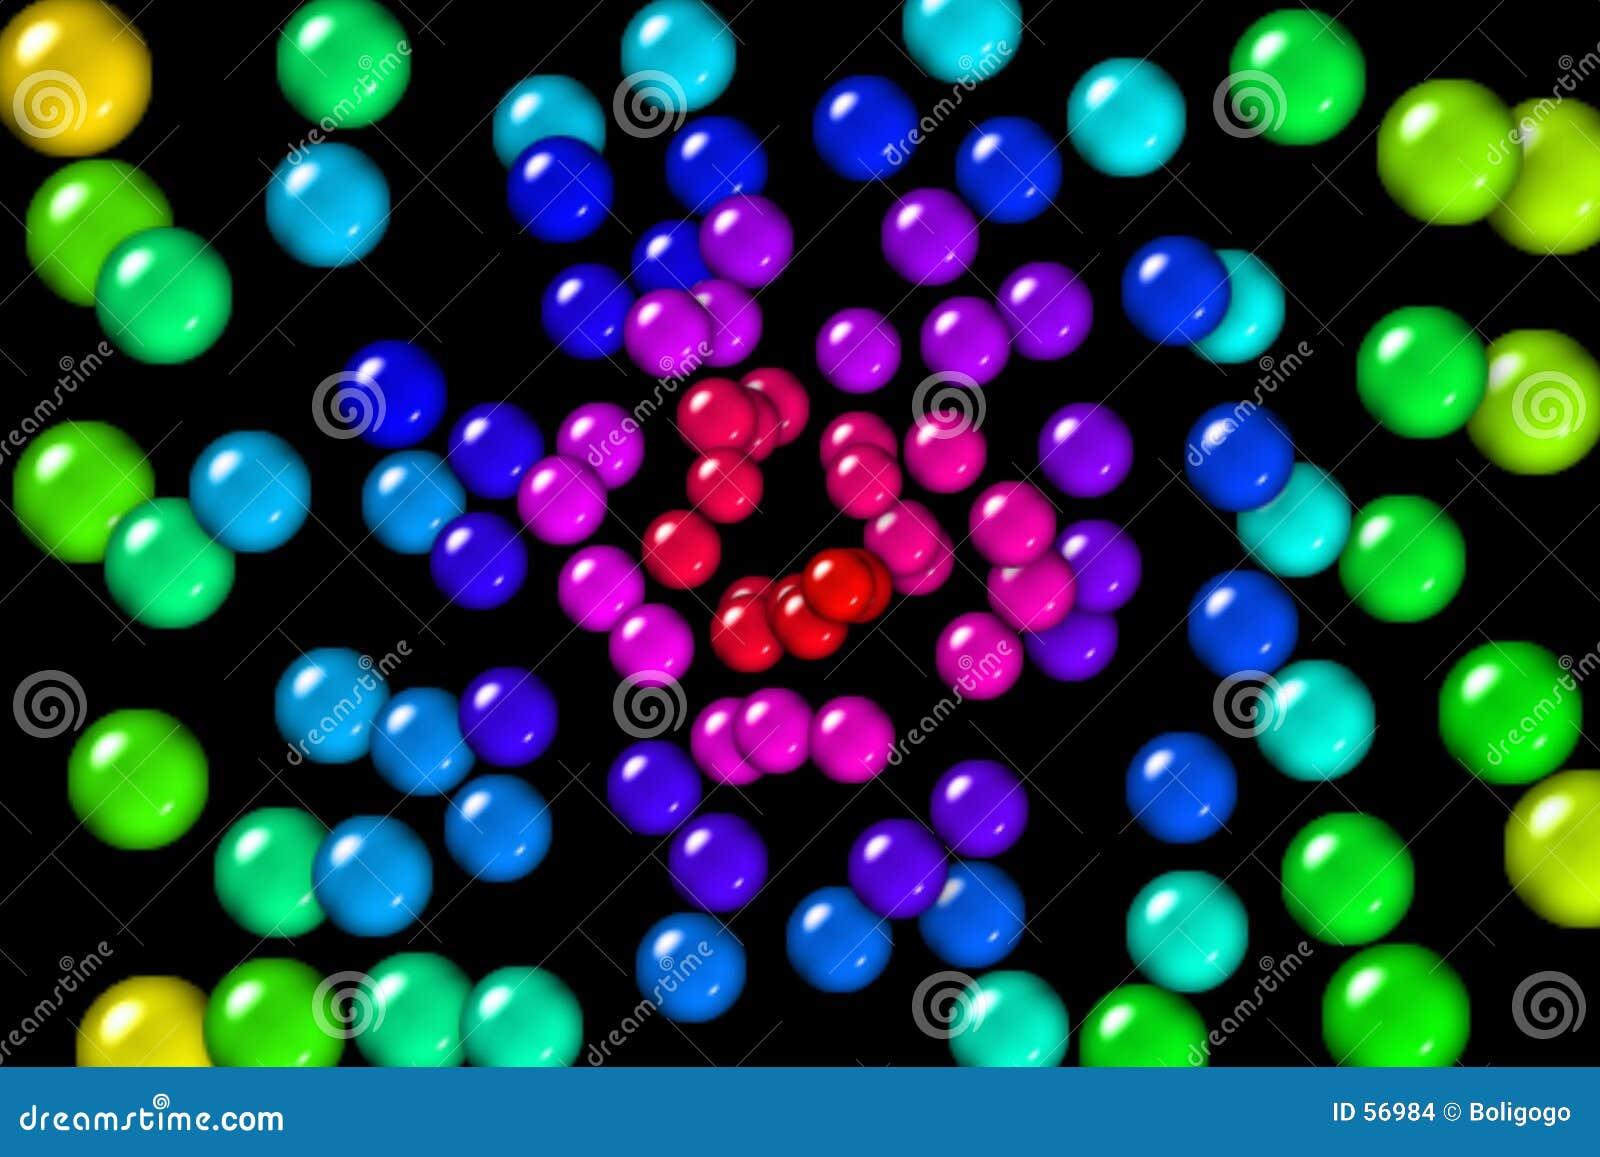 Download Billes De Gomme D'arc-en-ciel Illustration Stock - Illustration du lumières, bille: 56984